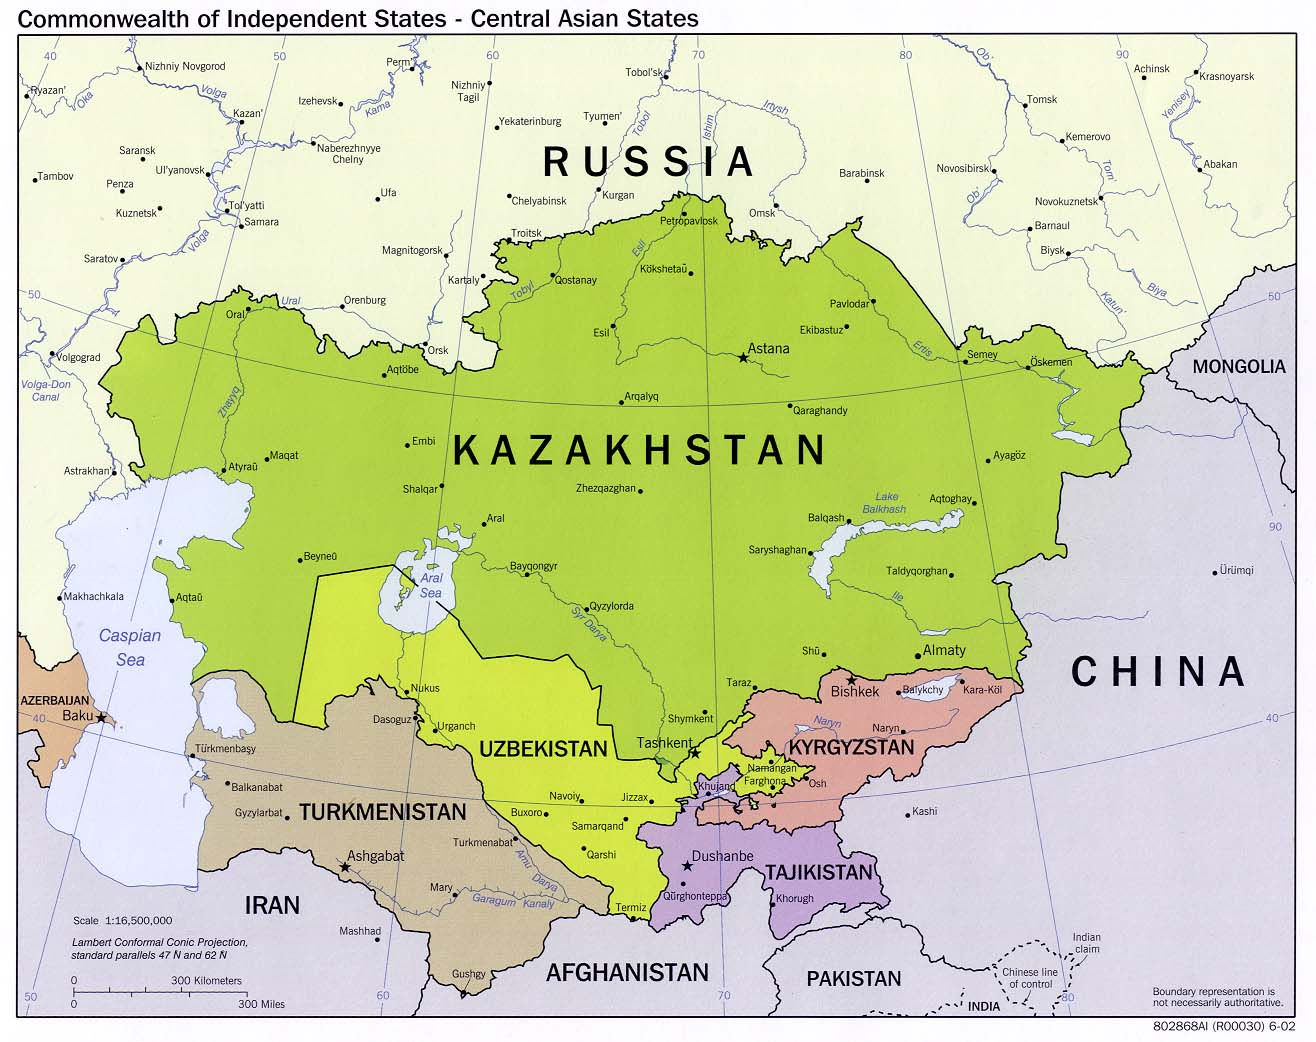 Ukraine Central Asian Republics Russian 58